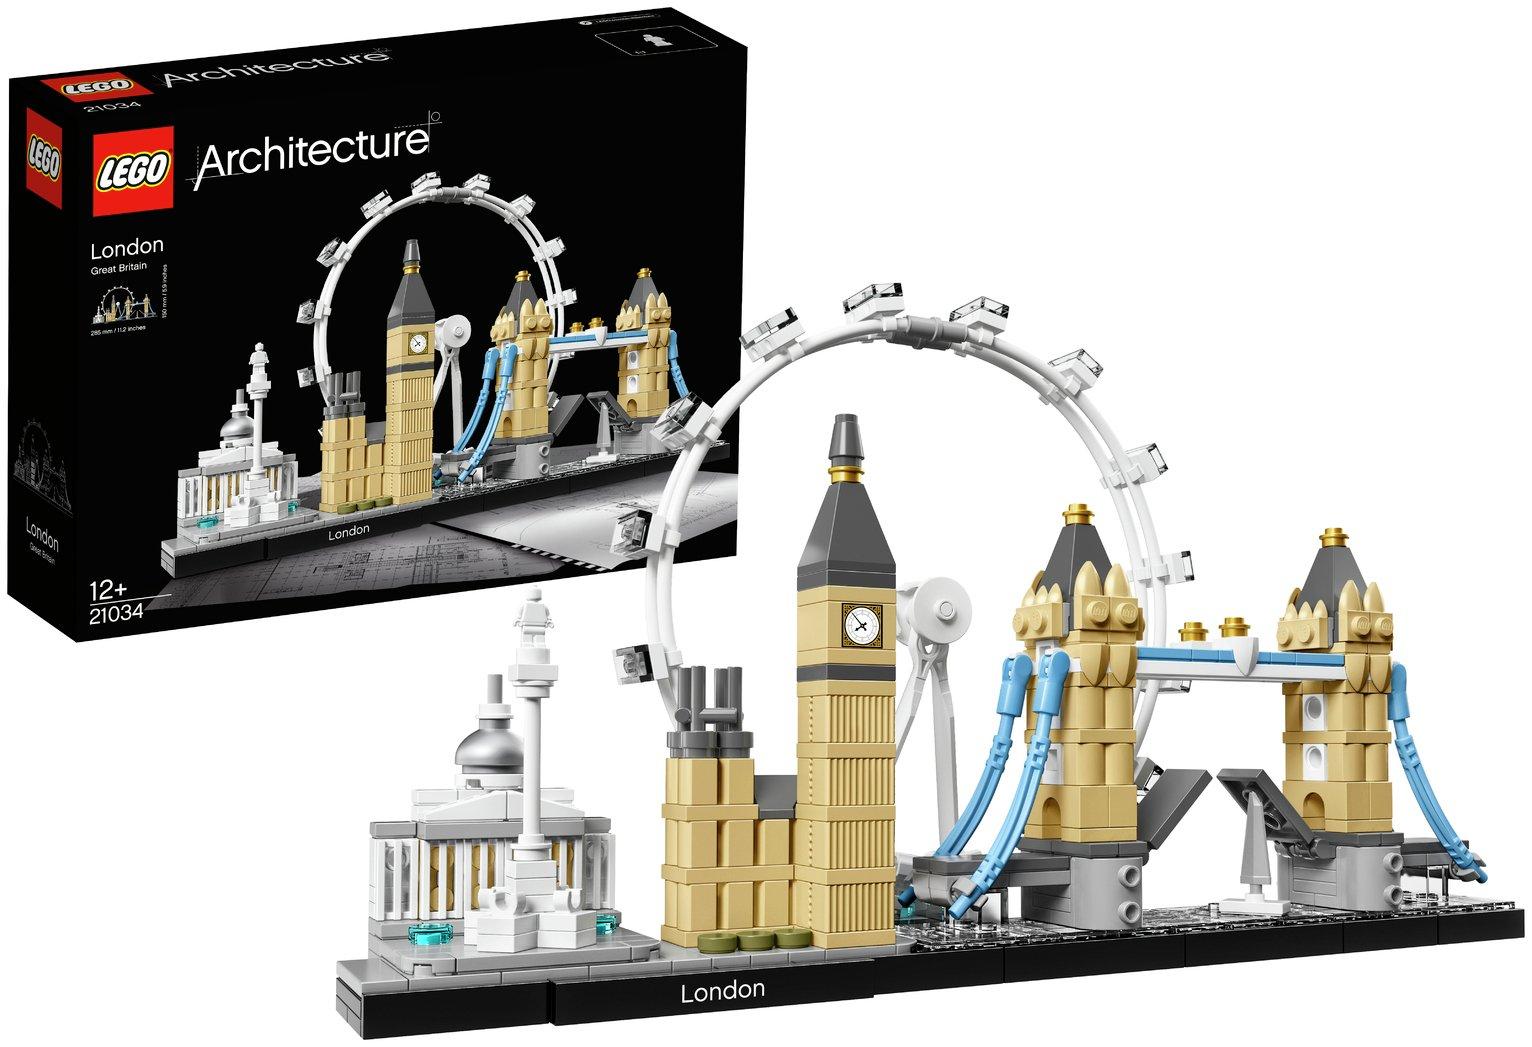 LEGO Architecture London City Building Kit - 21034